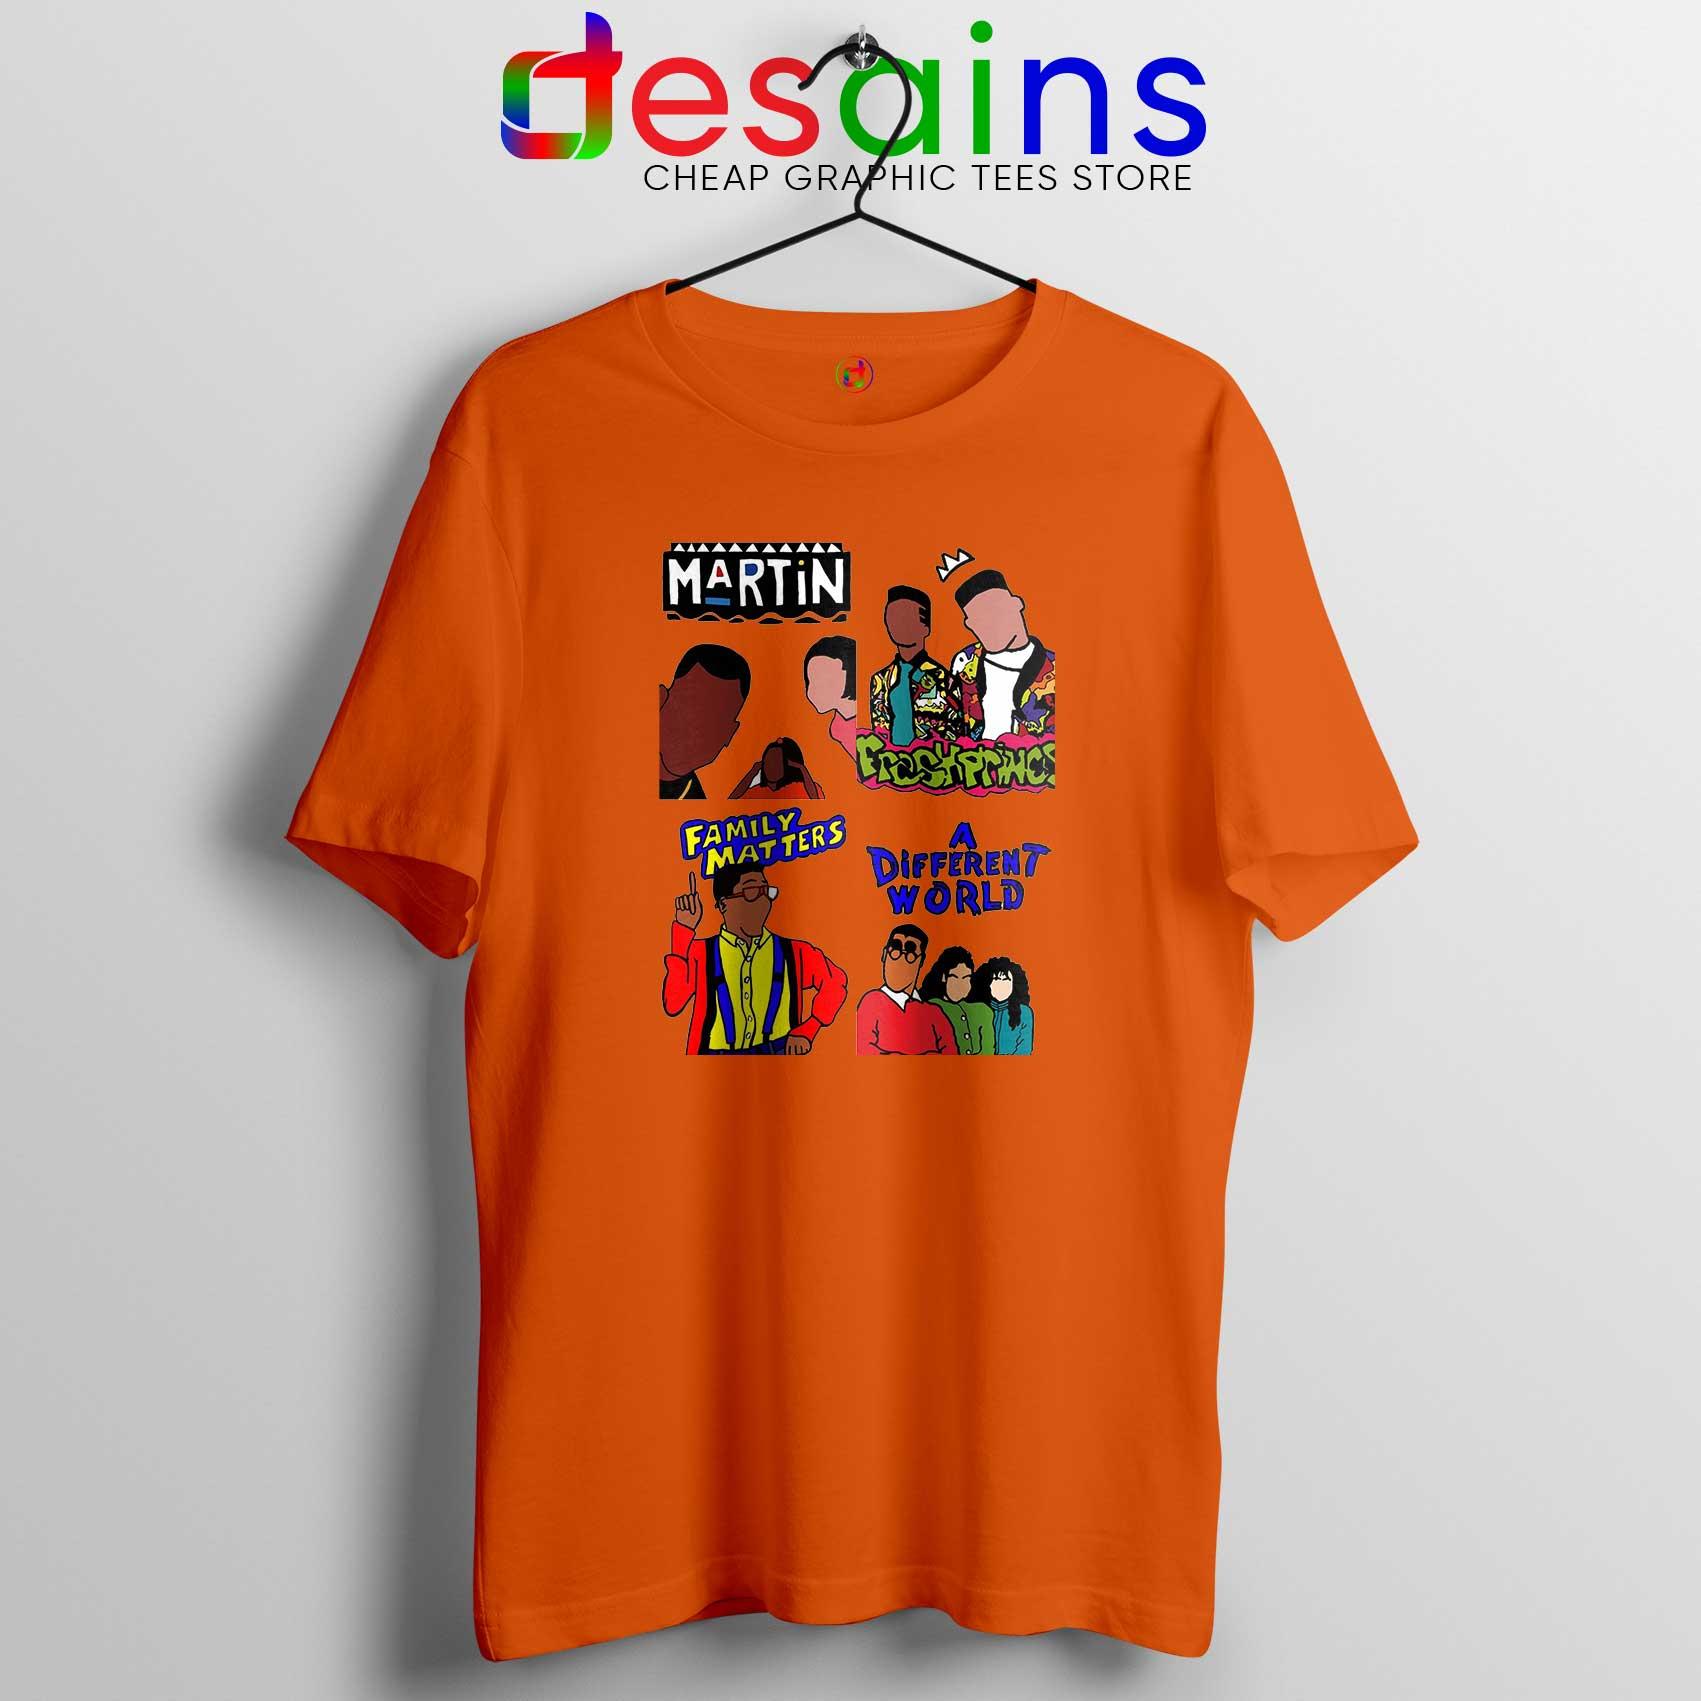 Tshirt Cheap Graphic Tee Shirts Martin